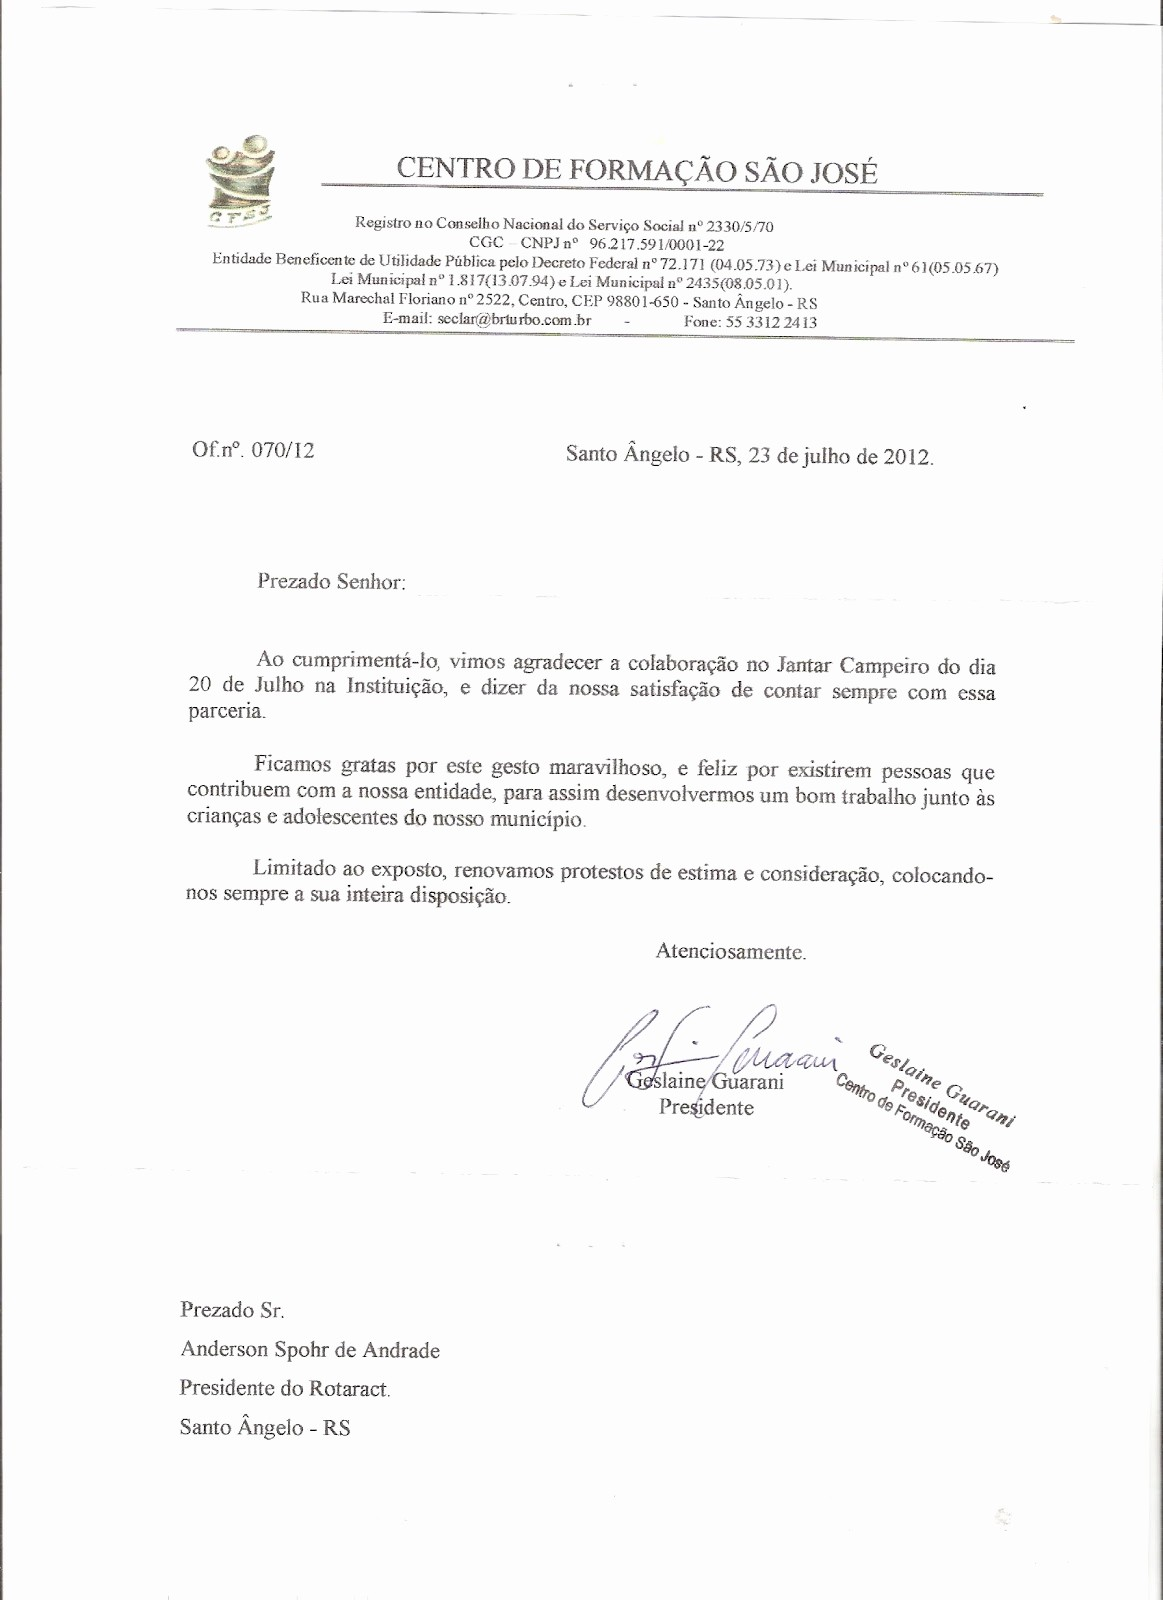 Modelo De Carta De Agradecimento Fresh Rotaract Club Santo Ngelo Carta De Agradecimento